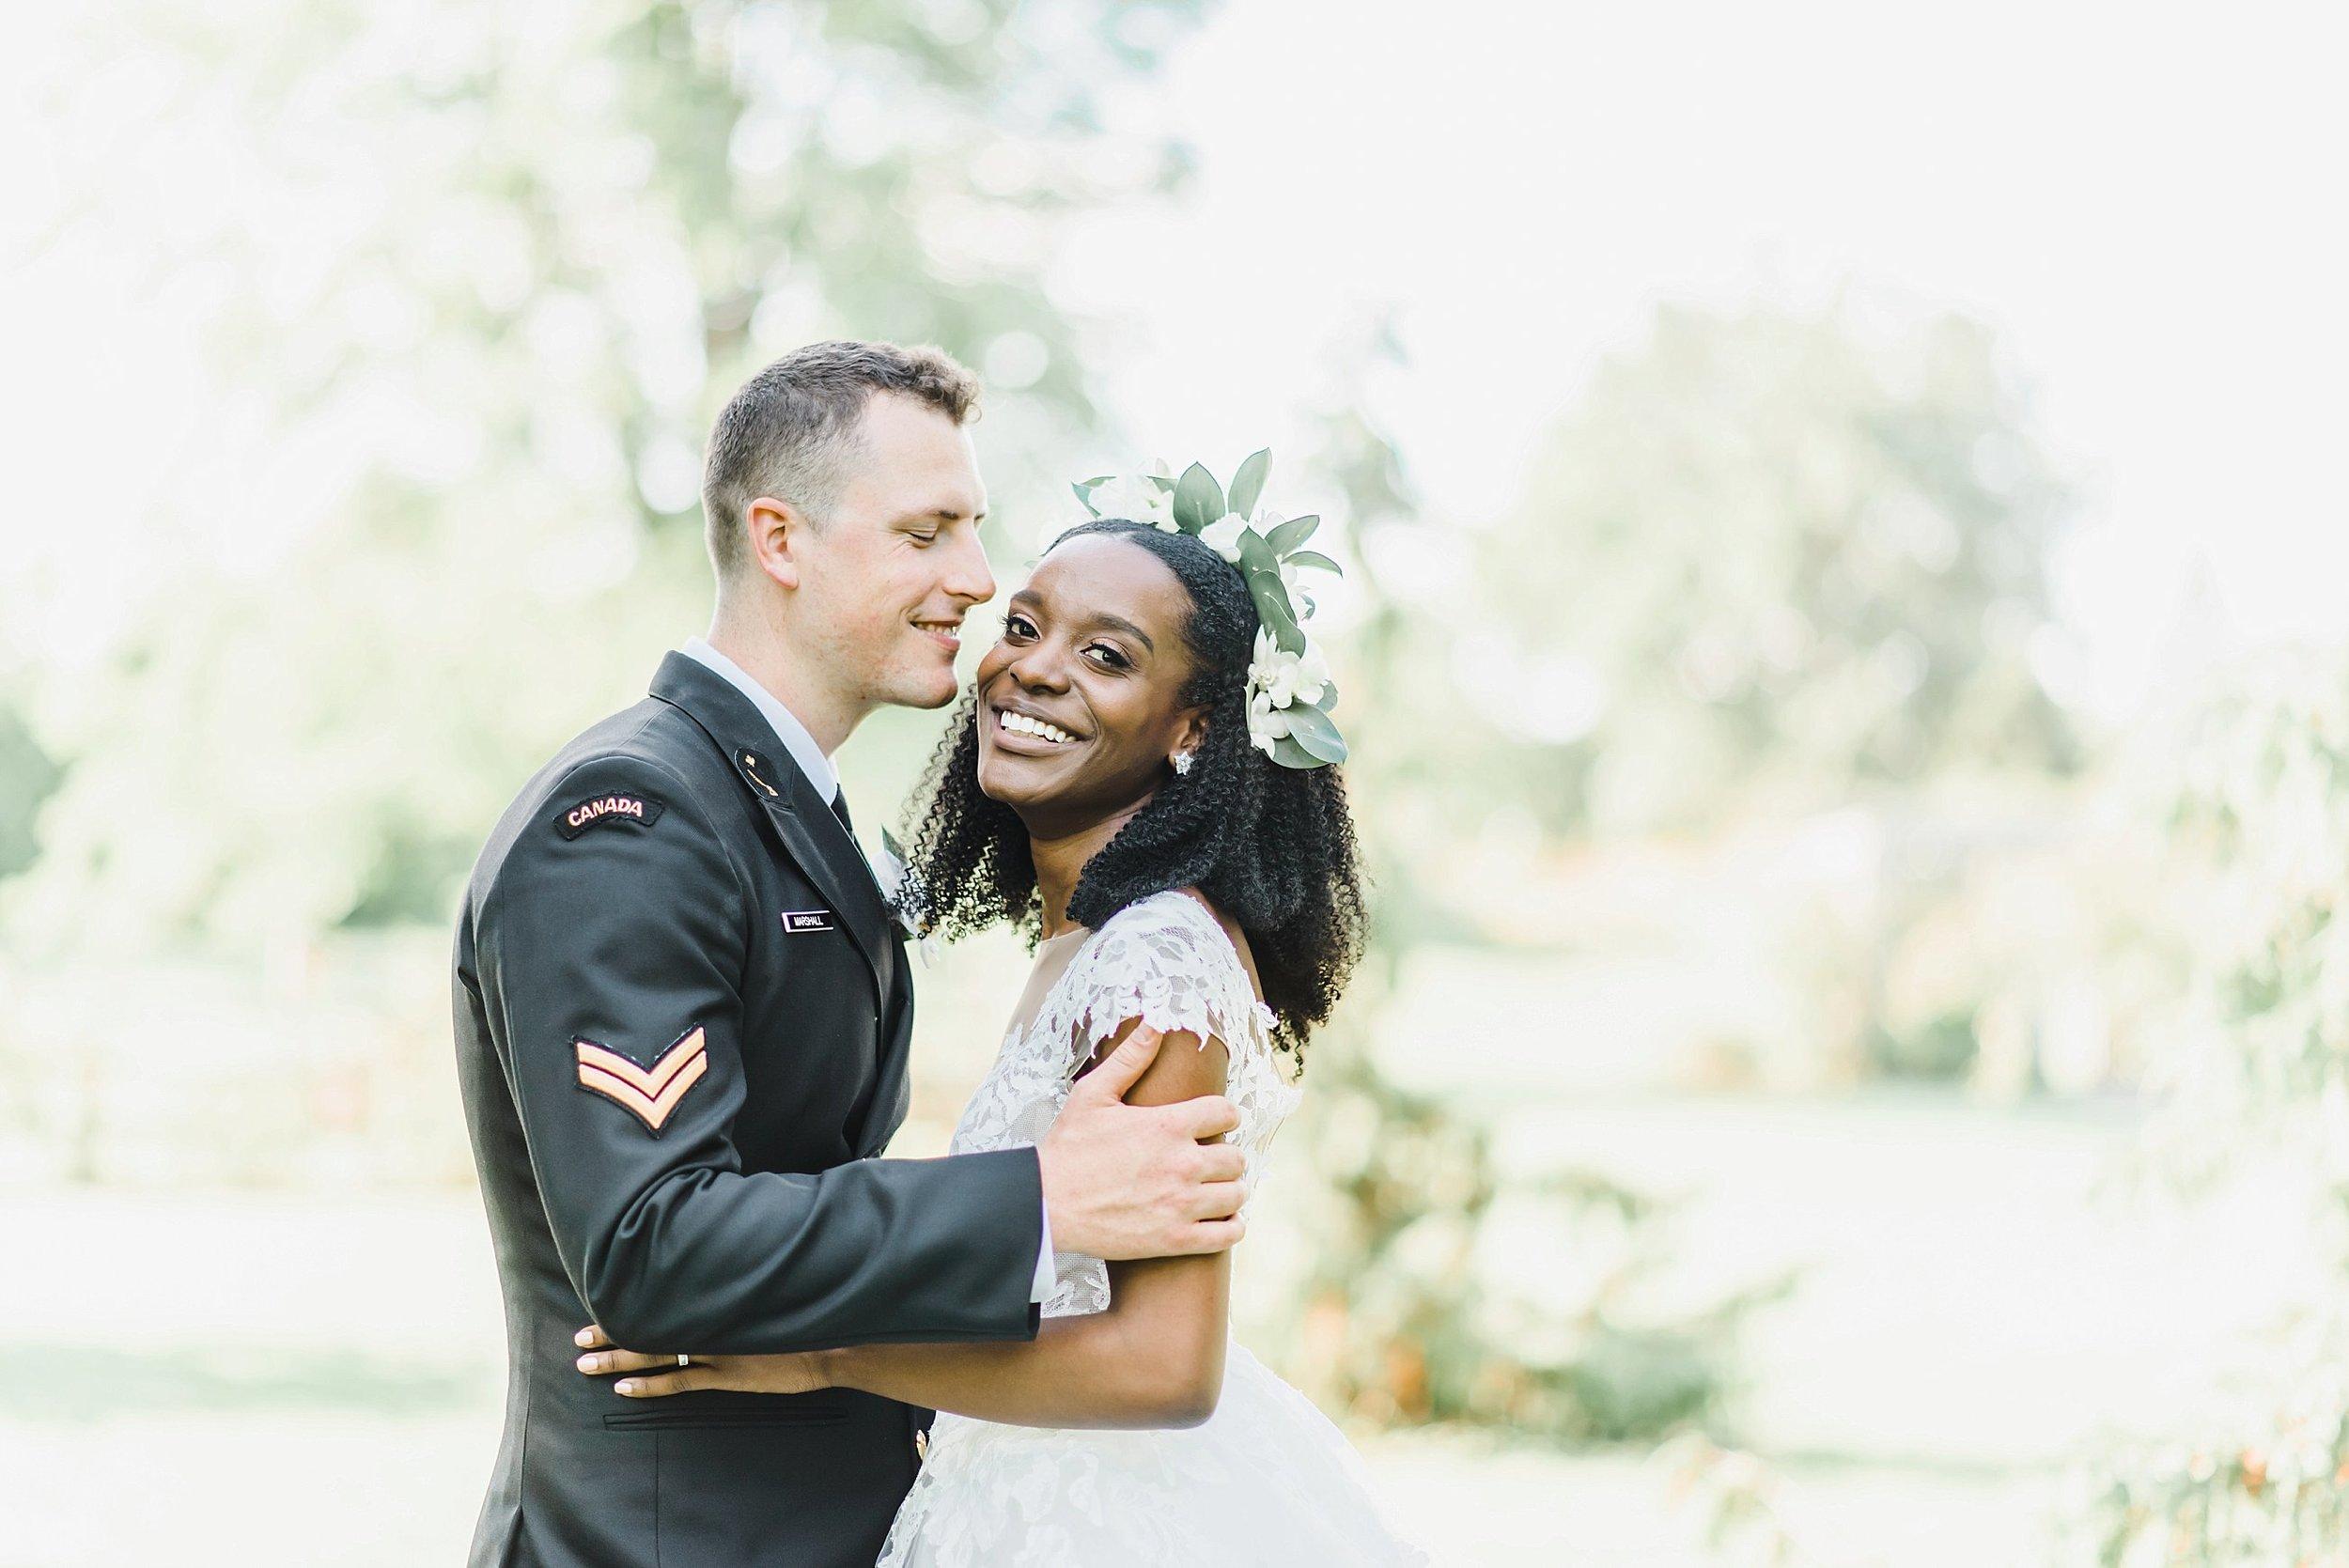 light airy indie fine art ottawa wedding photographer | Ali and Batoul Photography_1008.jpg